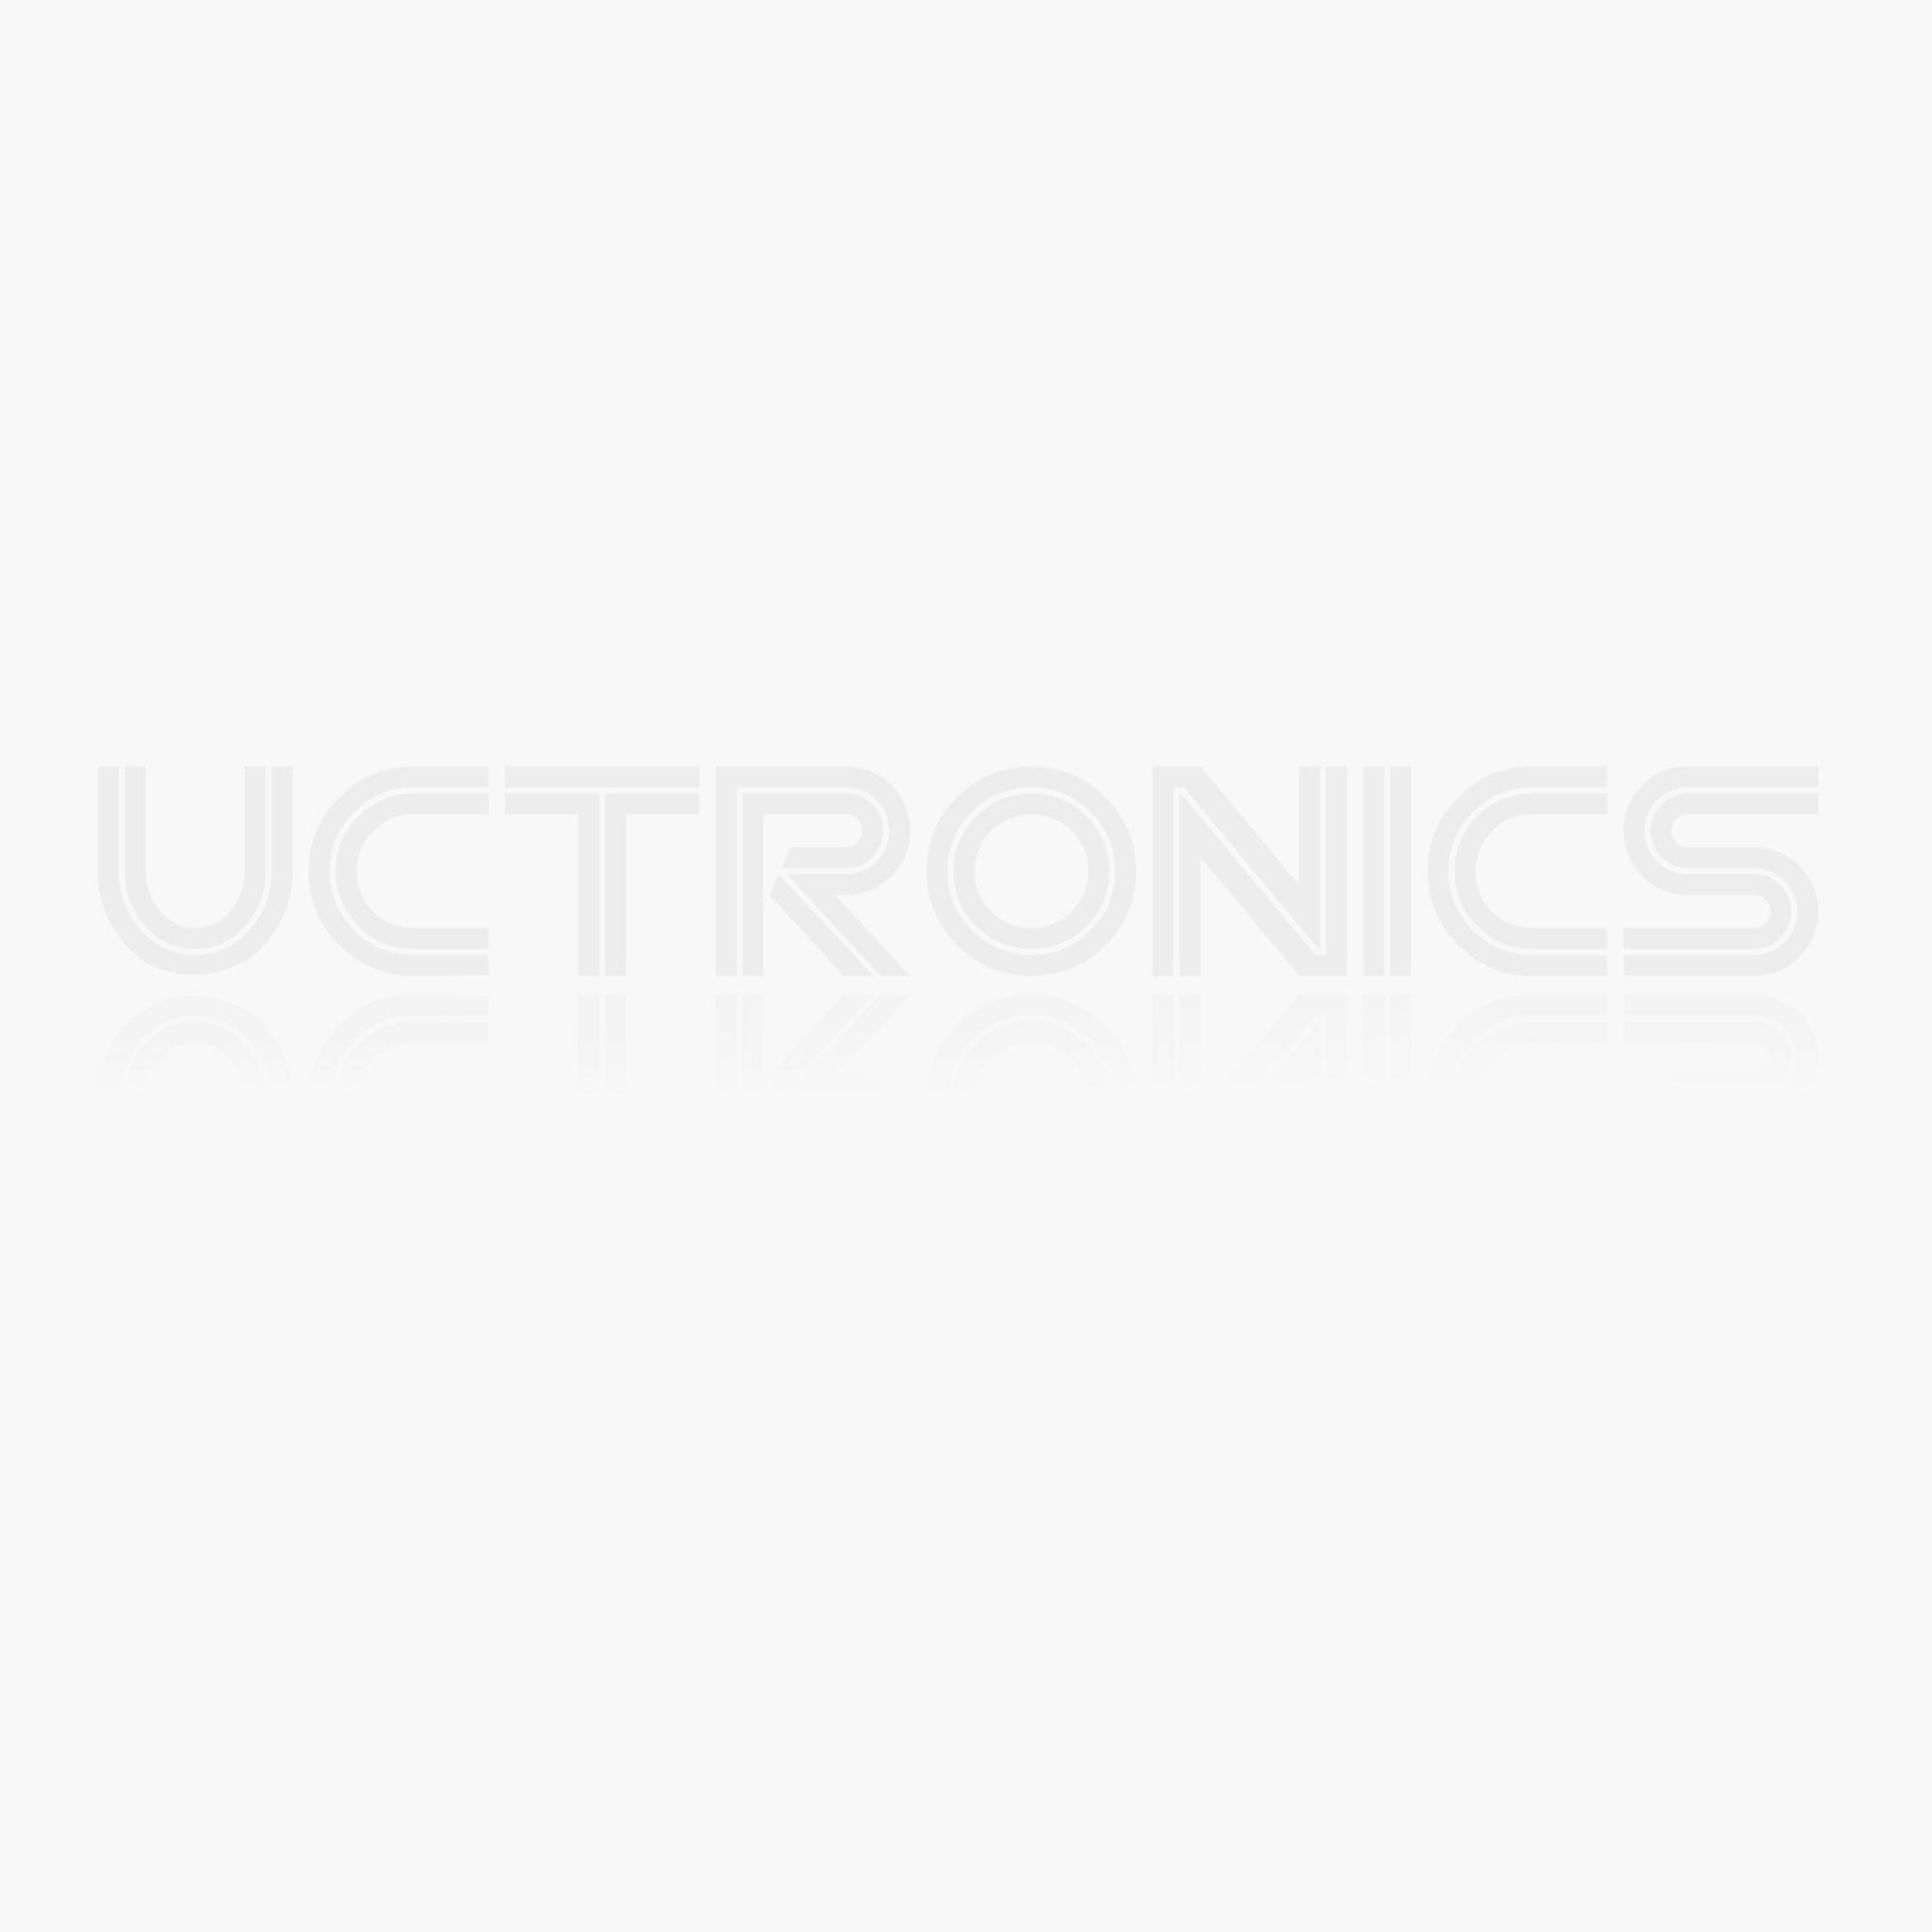 MMA7455 Digital Tilt sensor Accelerometer Sensor Module